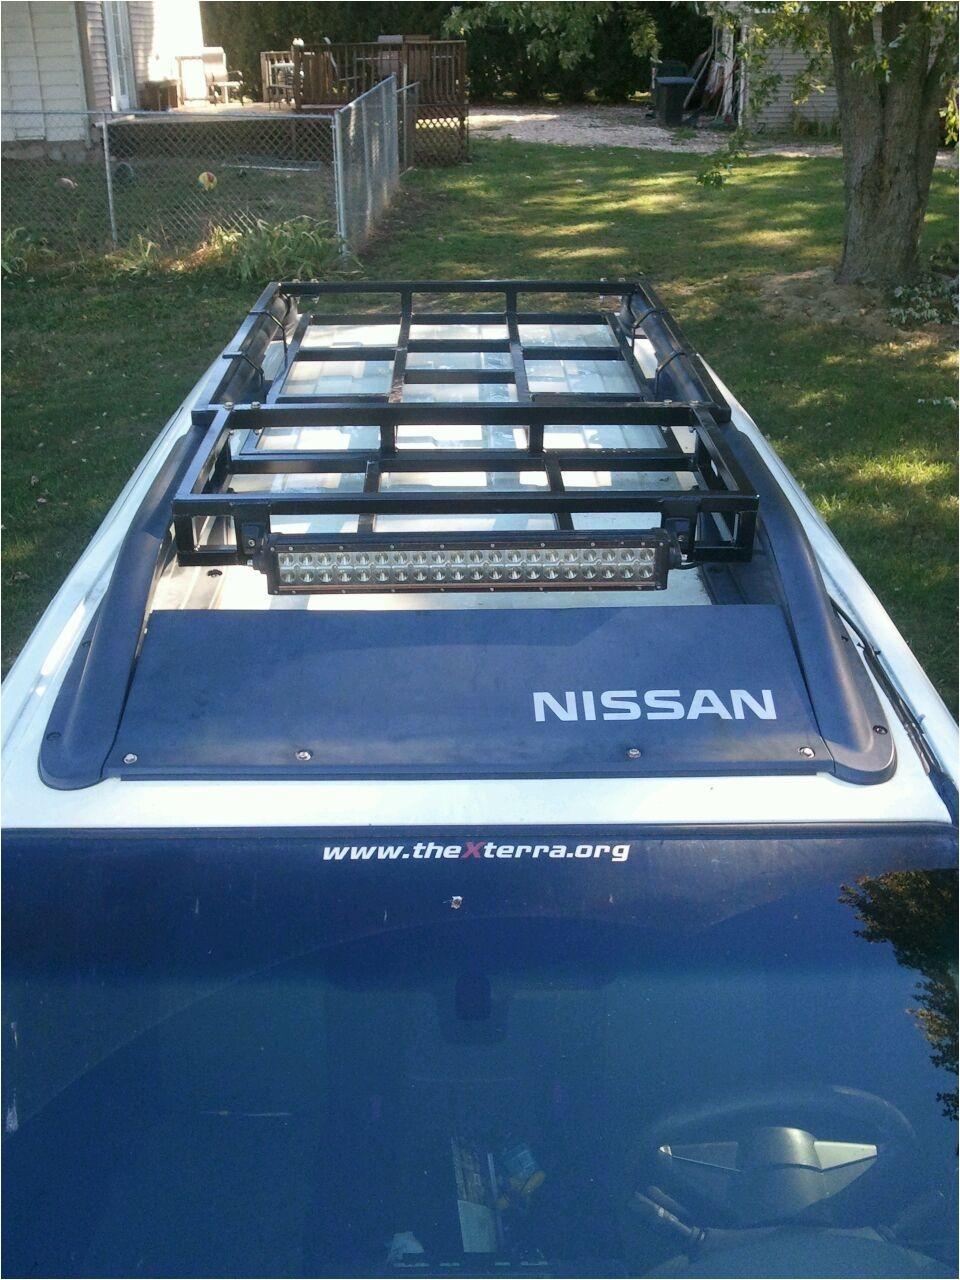 Diy Ski Rack for Car Diy Roof Rack Nissan Xterra Pinterest Roof Rack Nissan Xterra